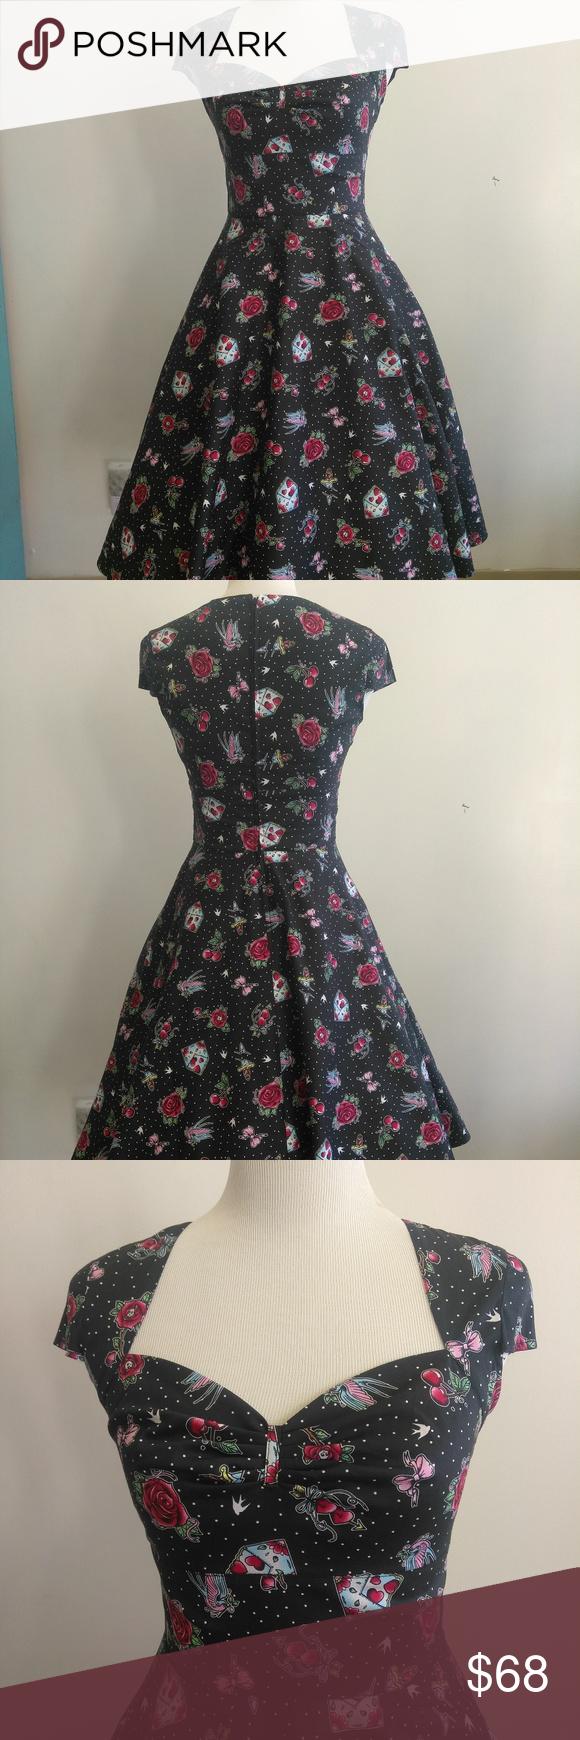 9a2db11954f7 Stevie Tattoo Art Swing Dress Printed 50's style swing dress Print is  inspired by flash art